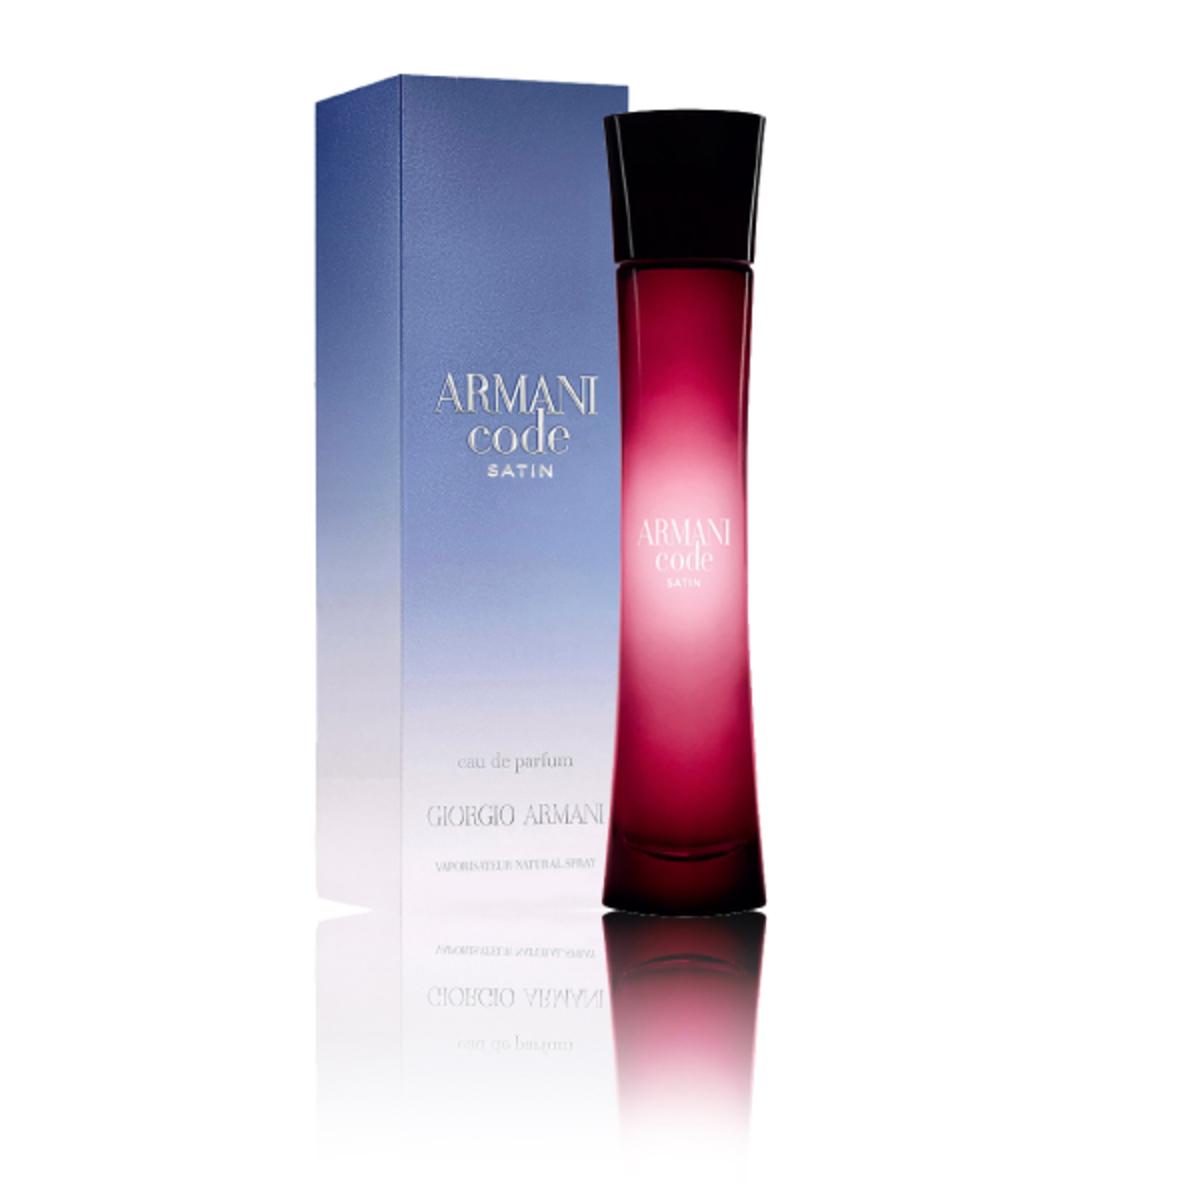 a083b74443a GIORGIO ARMANI Armani Code Satin Eau de Parfum Spray for Women 75ml ...